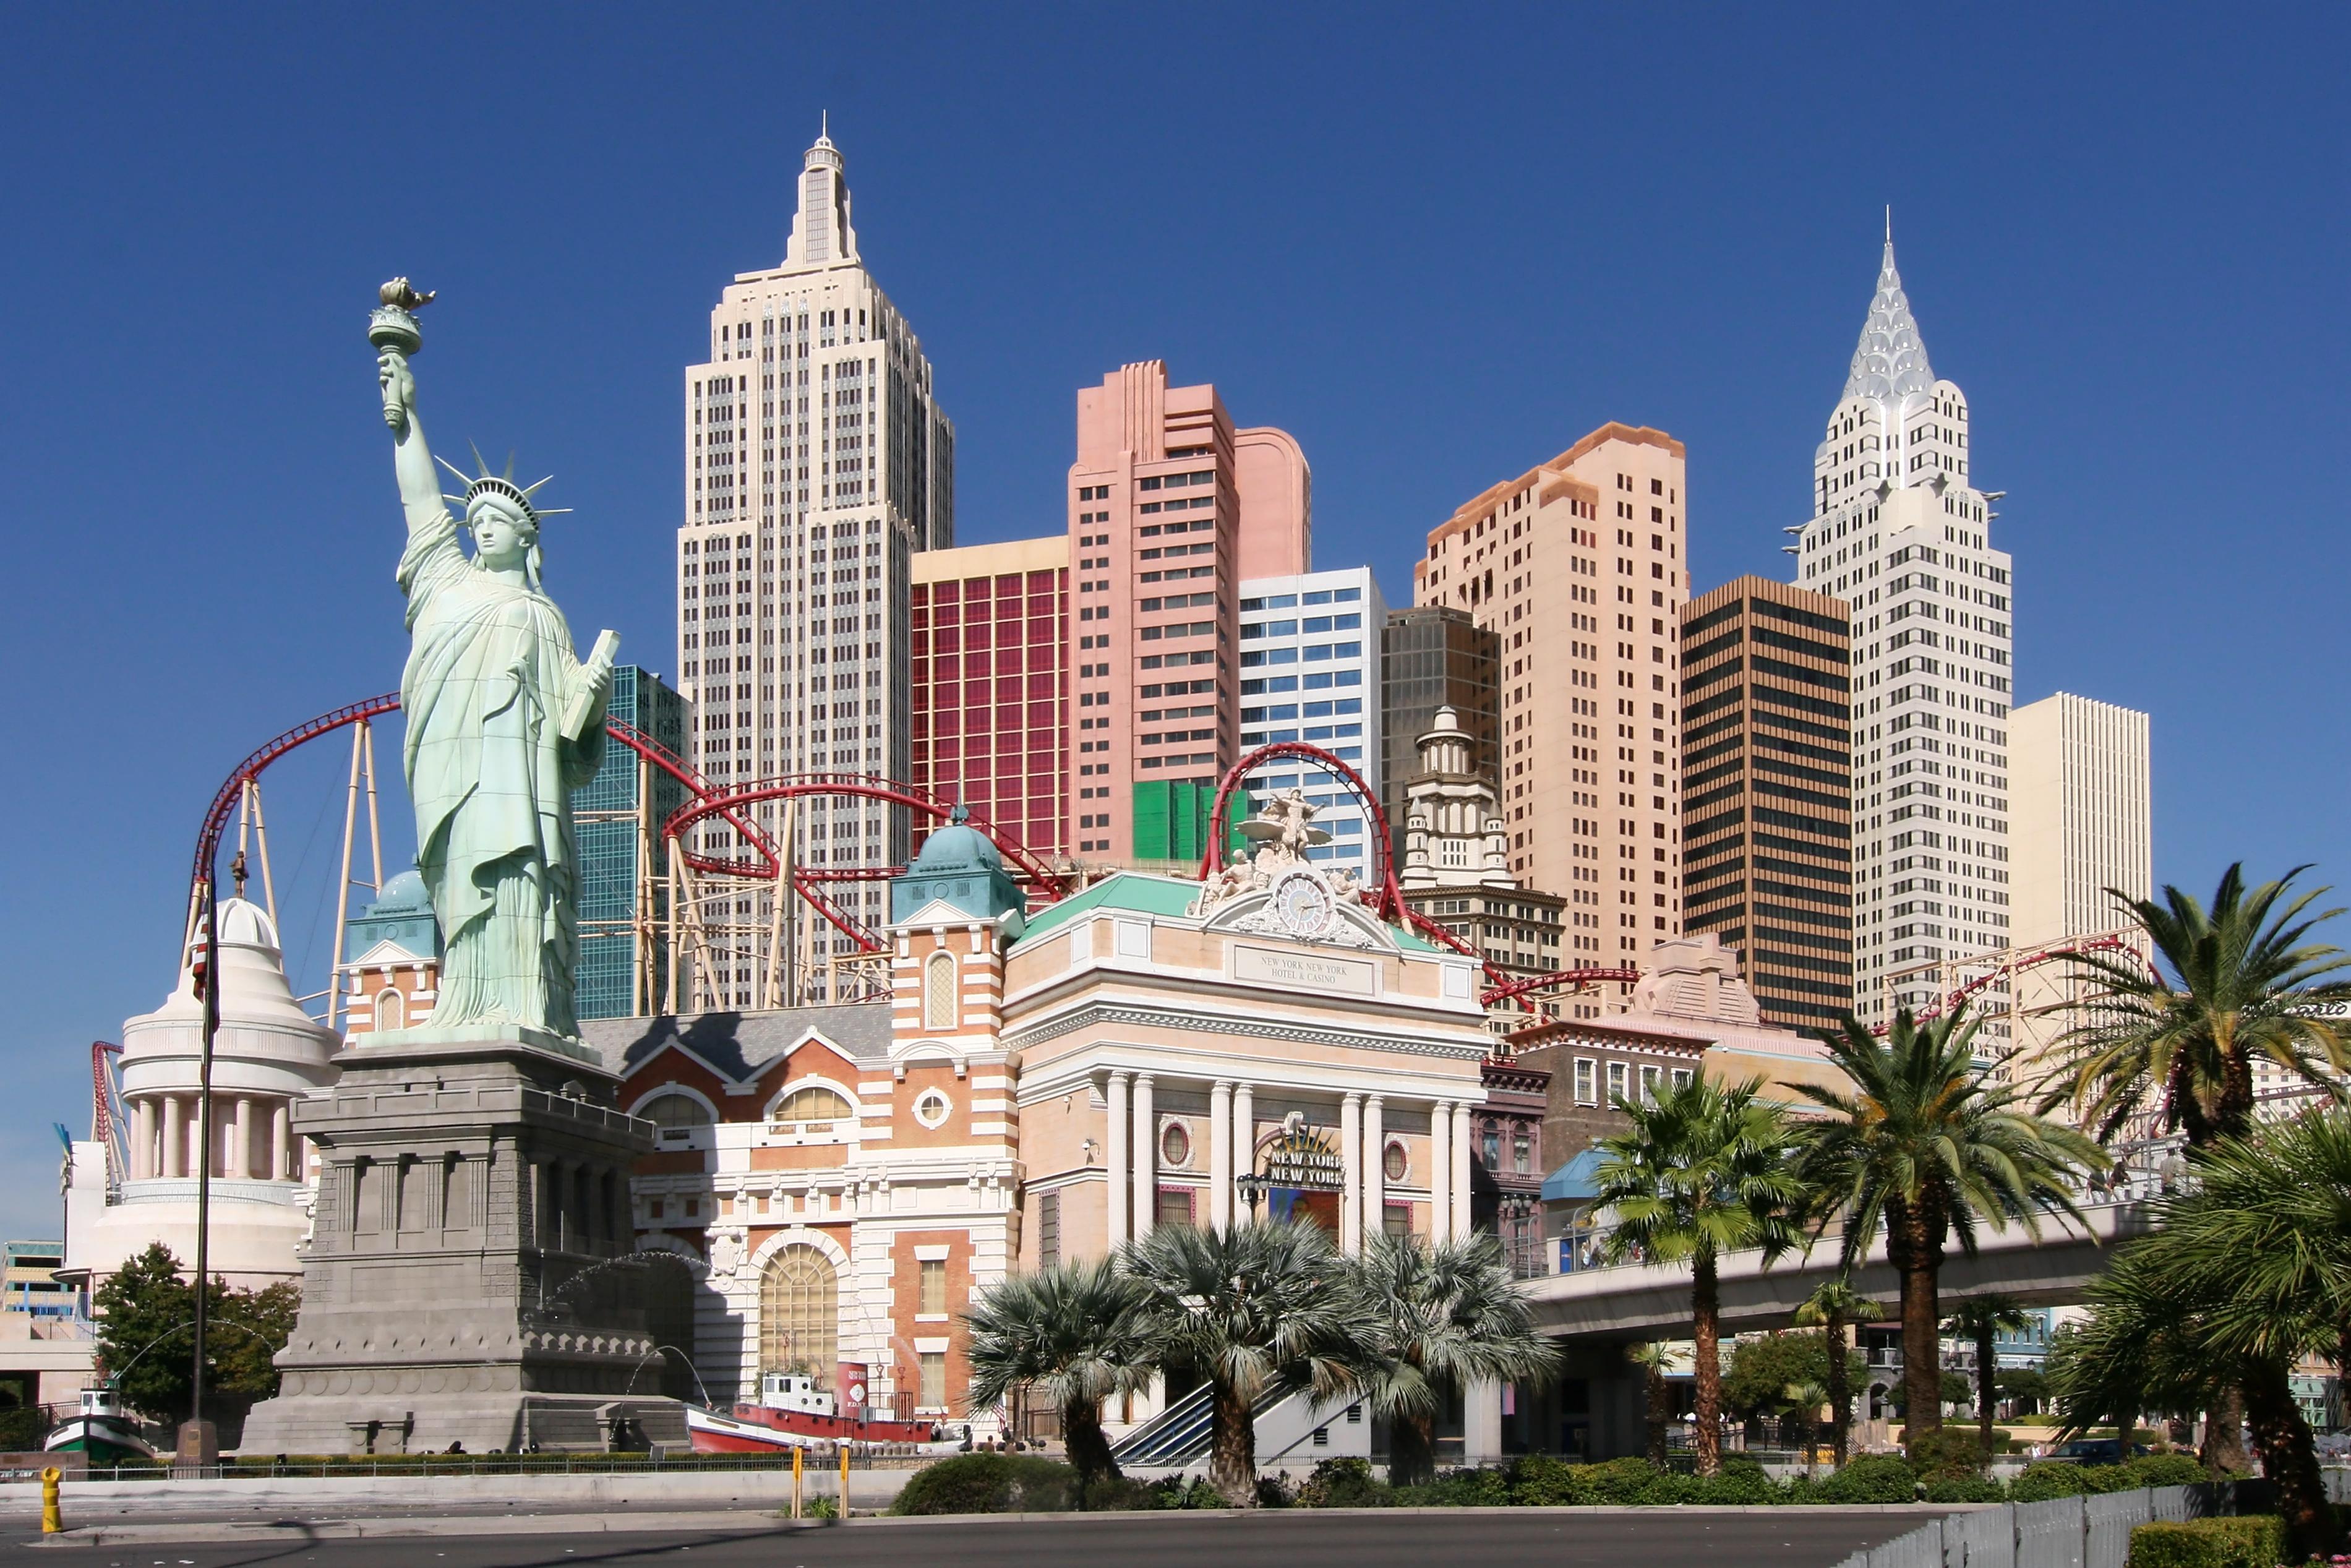 Hotel Le New York New York - Las Vegas